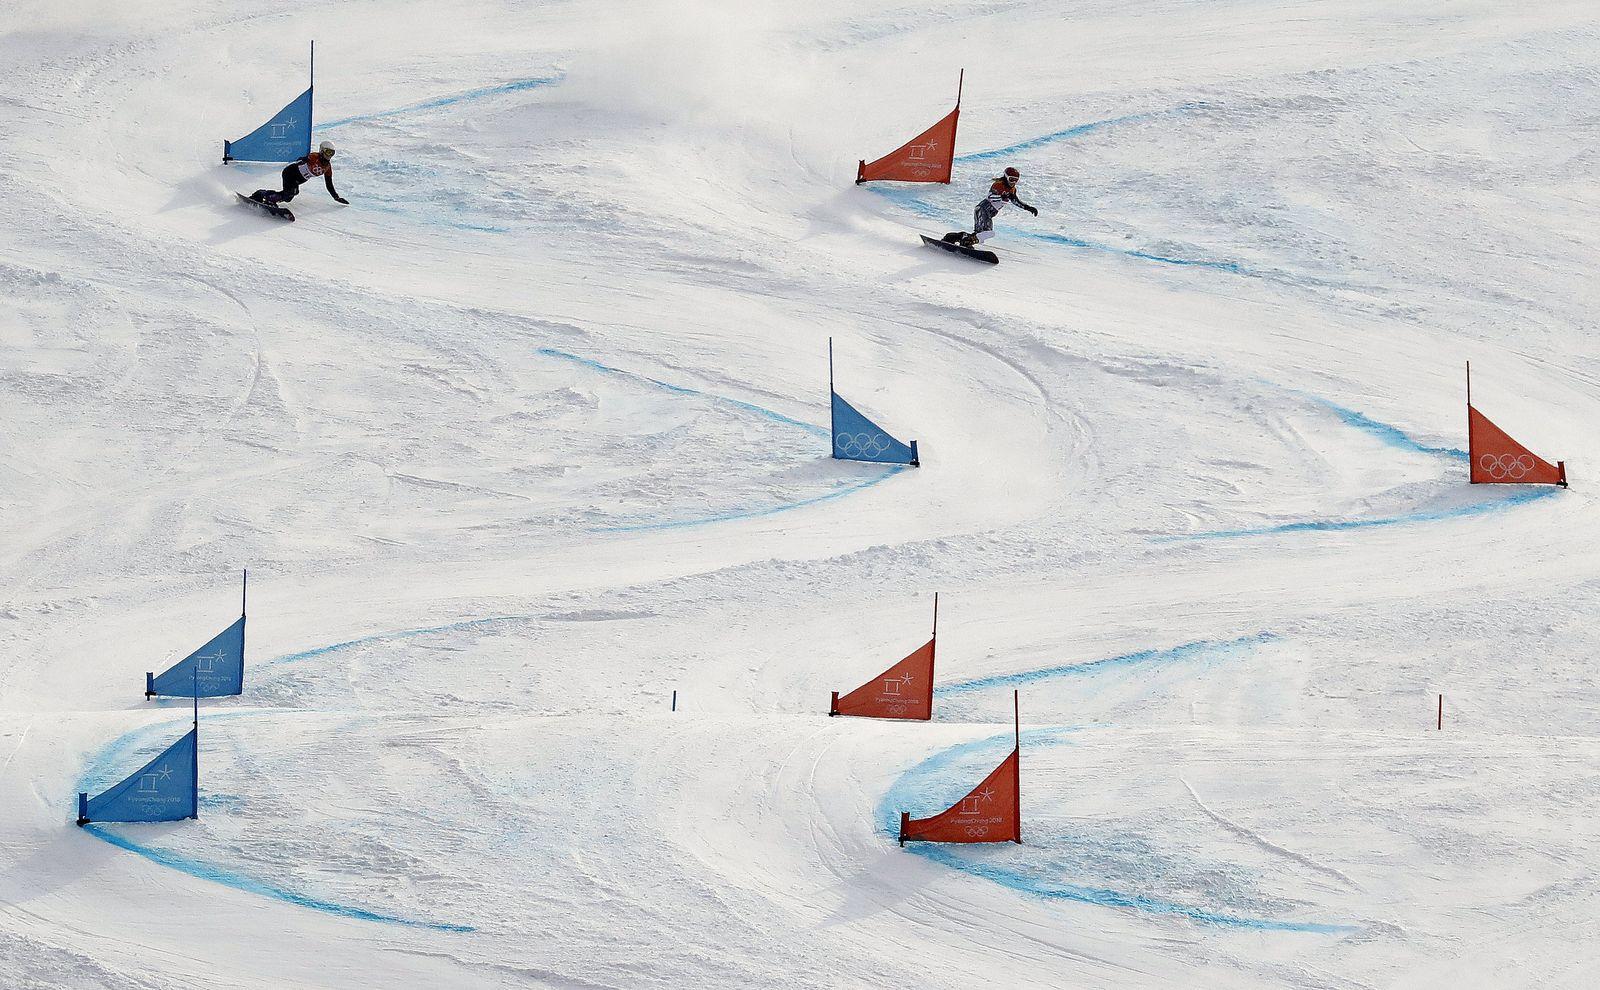 Pyeongchang 2018 - Snowboard Strecke